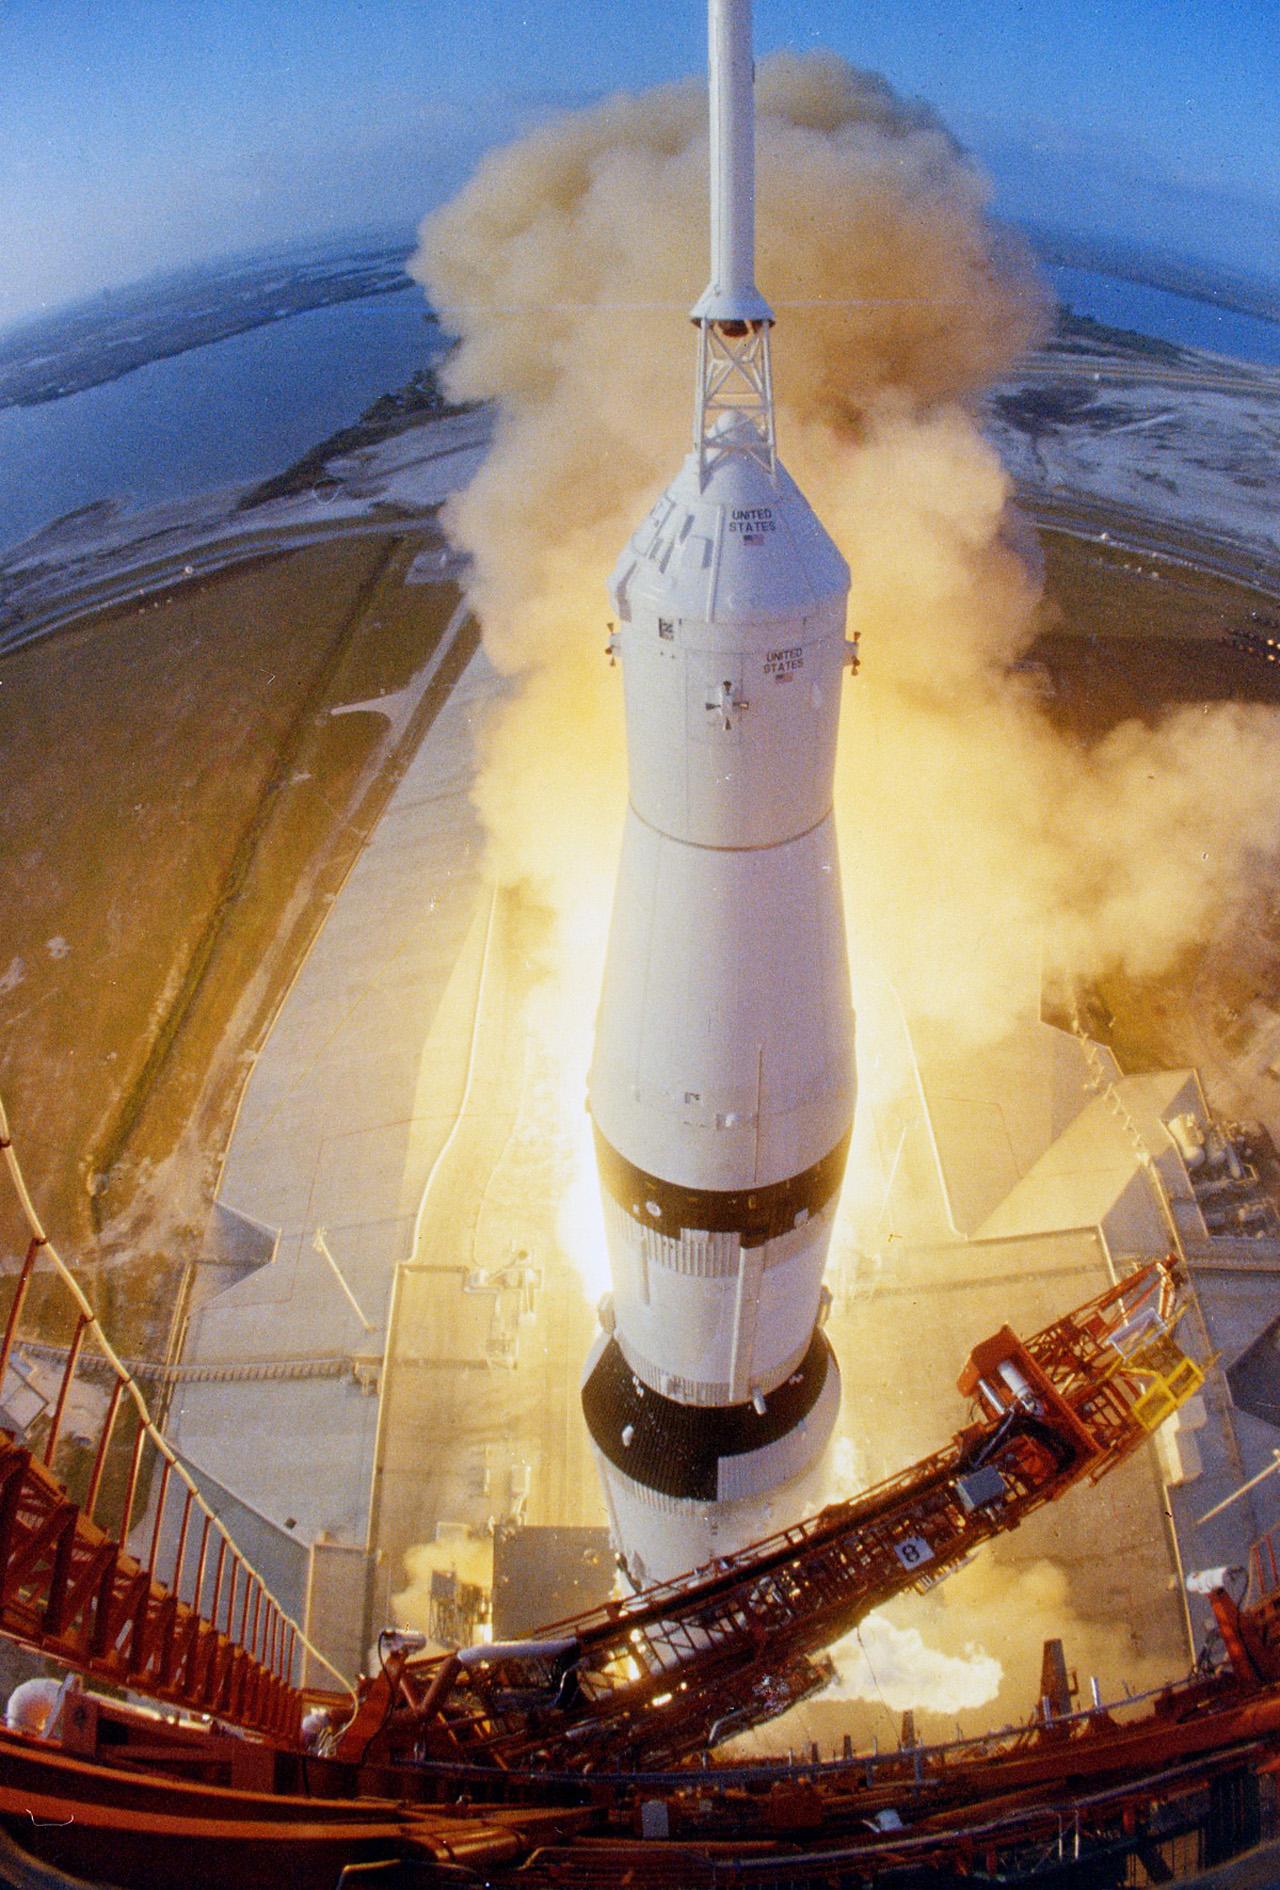 apollo 11 space mission launch date - photo #16